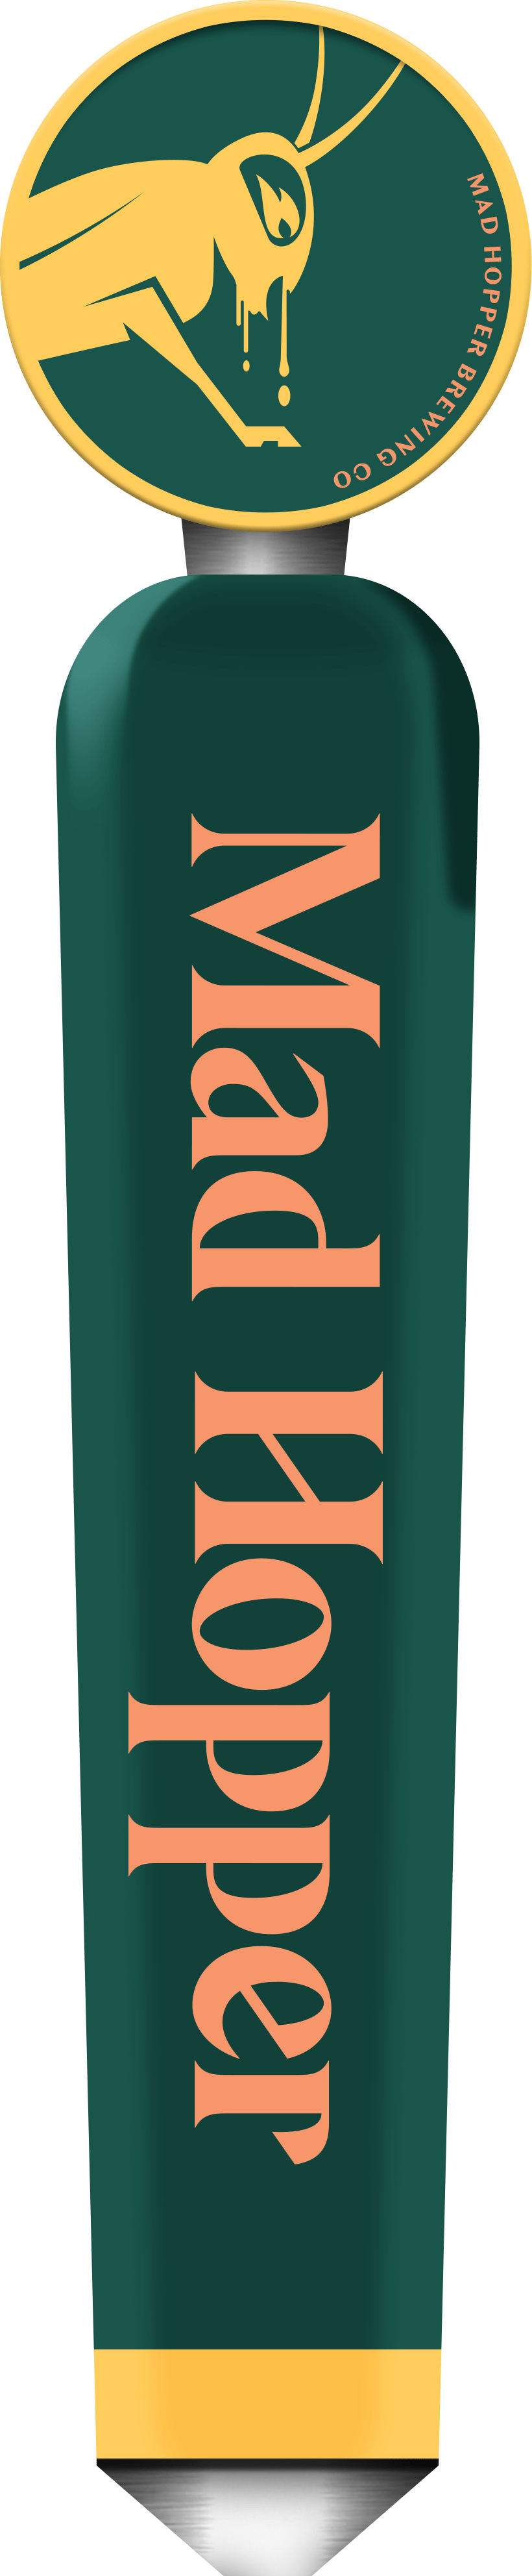 Truth Serum Kveik Double IPA beer tap label, Mad Hopper Brewing Co., Helsinki, Finland